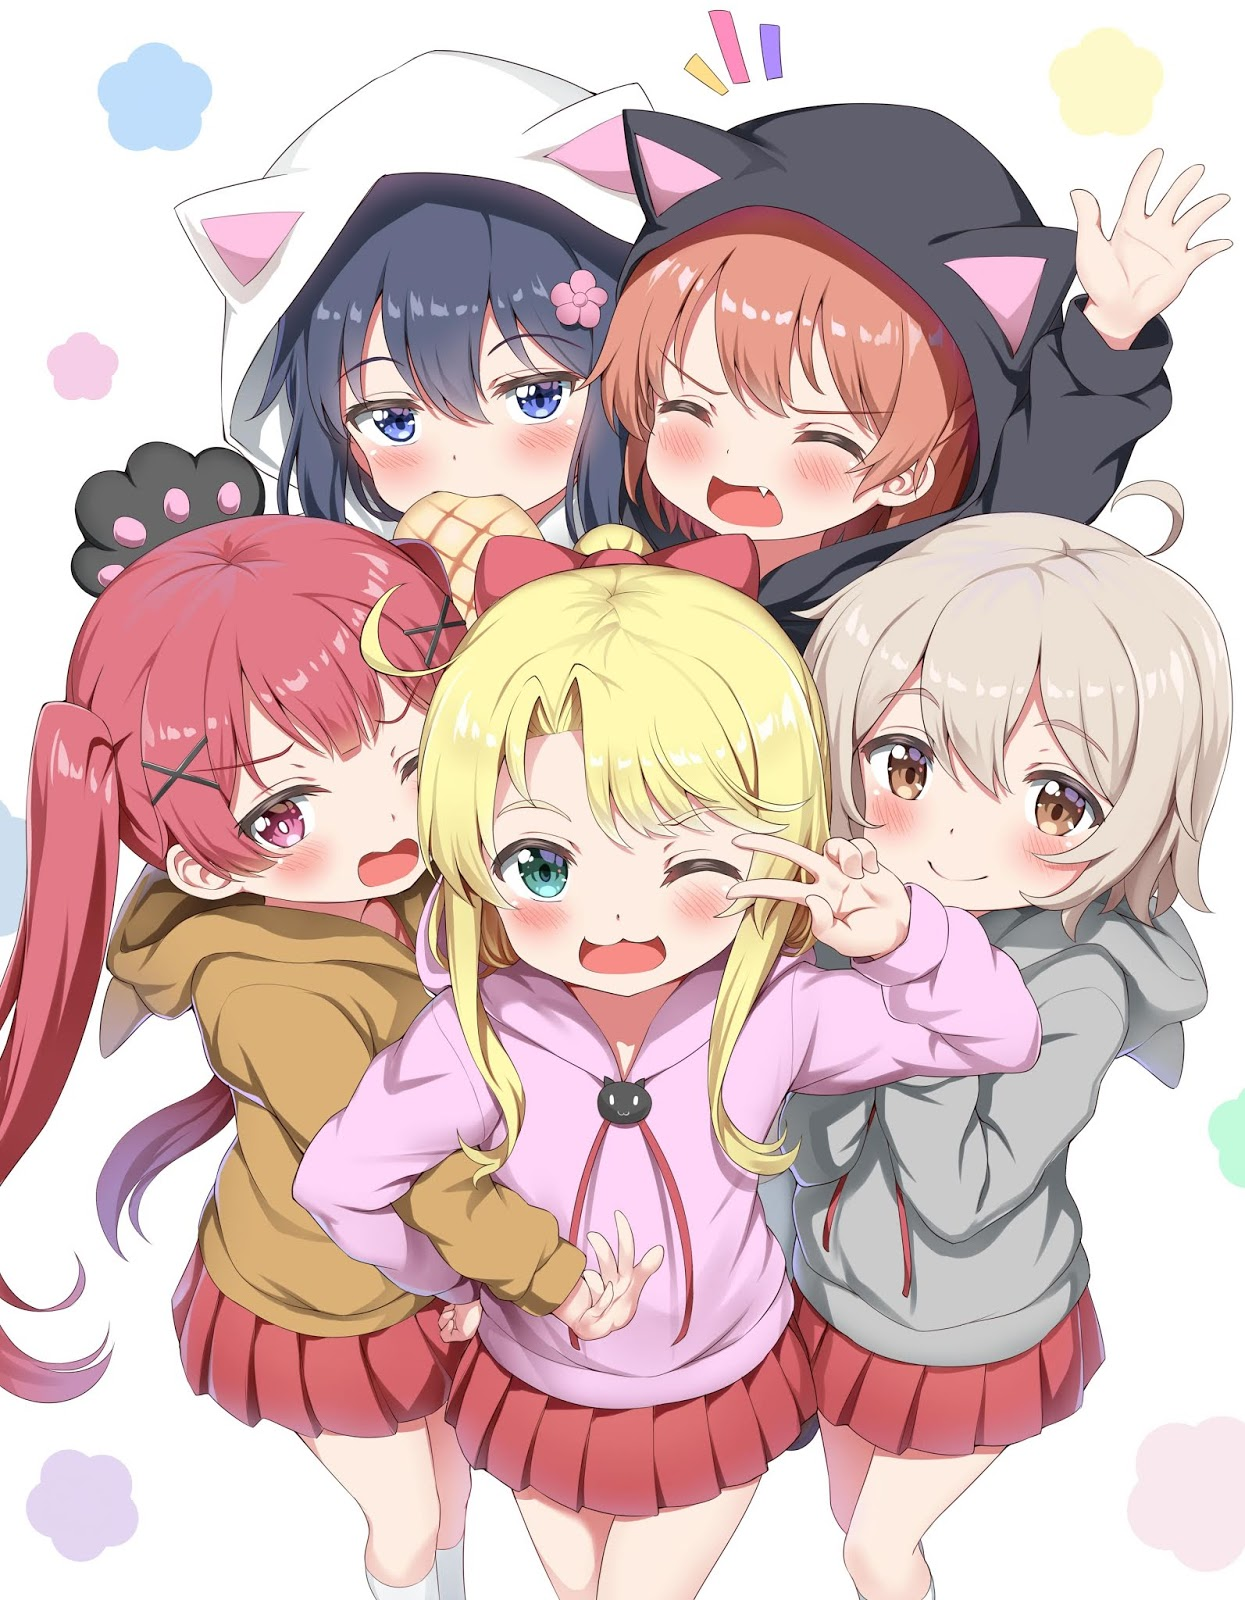 جميع حلقات انمى Watashi ni Tenshi ga Maiorita مترجم أونلاين كامل تحميل و مشاهدة حصريا